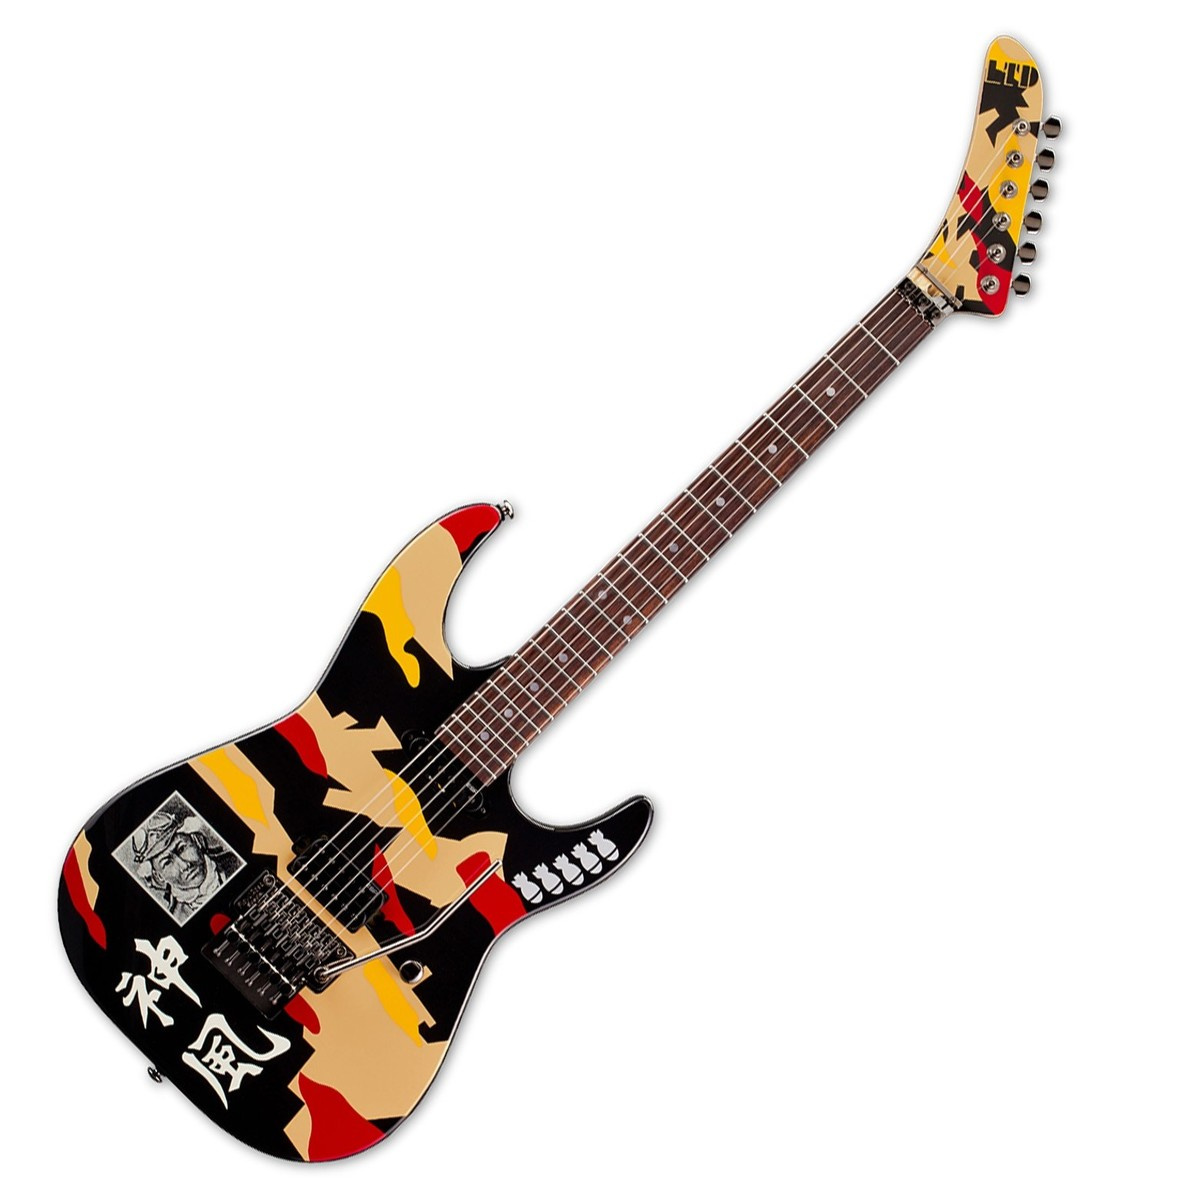 disc esp ltd gl200k george lynch electric guitar kamikaze graphic at gear4music. Black Bedroom Furniture Sets. Home Design Ideas